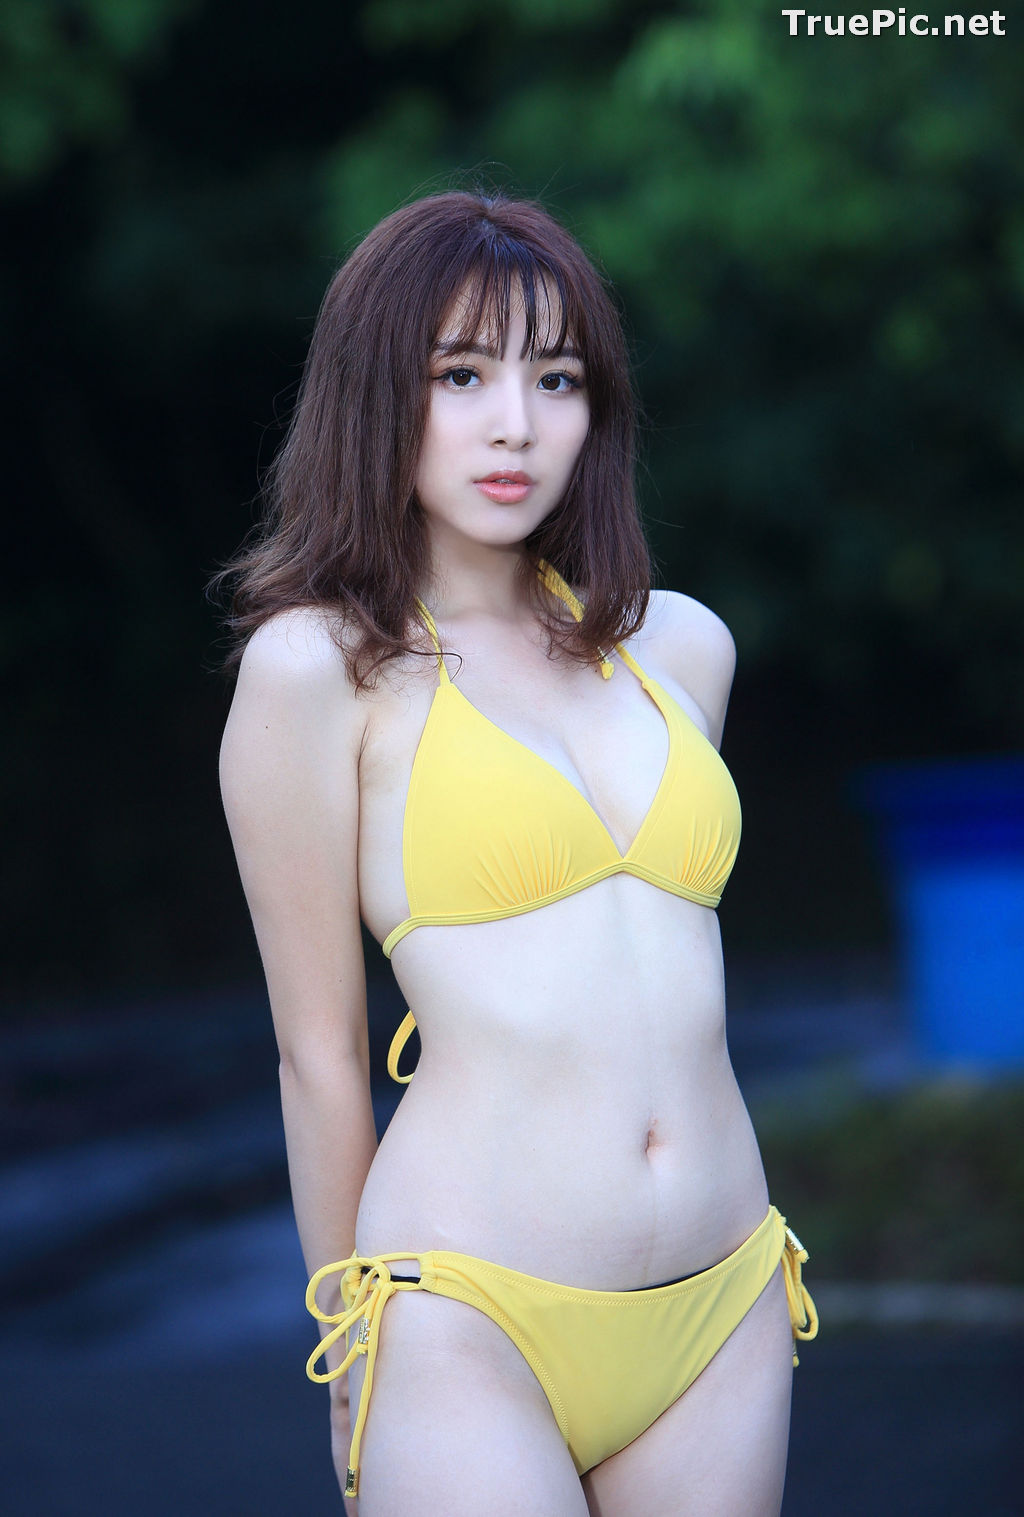 Image Taiwanese Model - Ash Ley - Yellow Bikini at Taipei Water Museum - TruePic.net - Picture-8